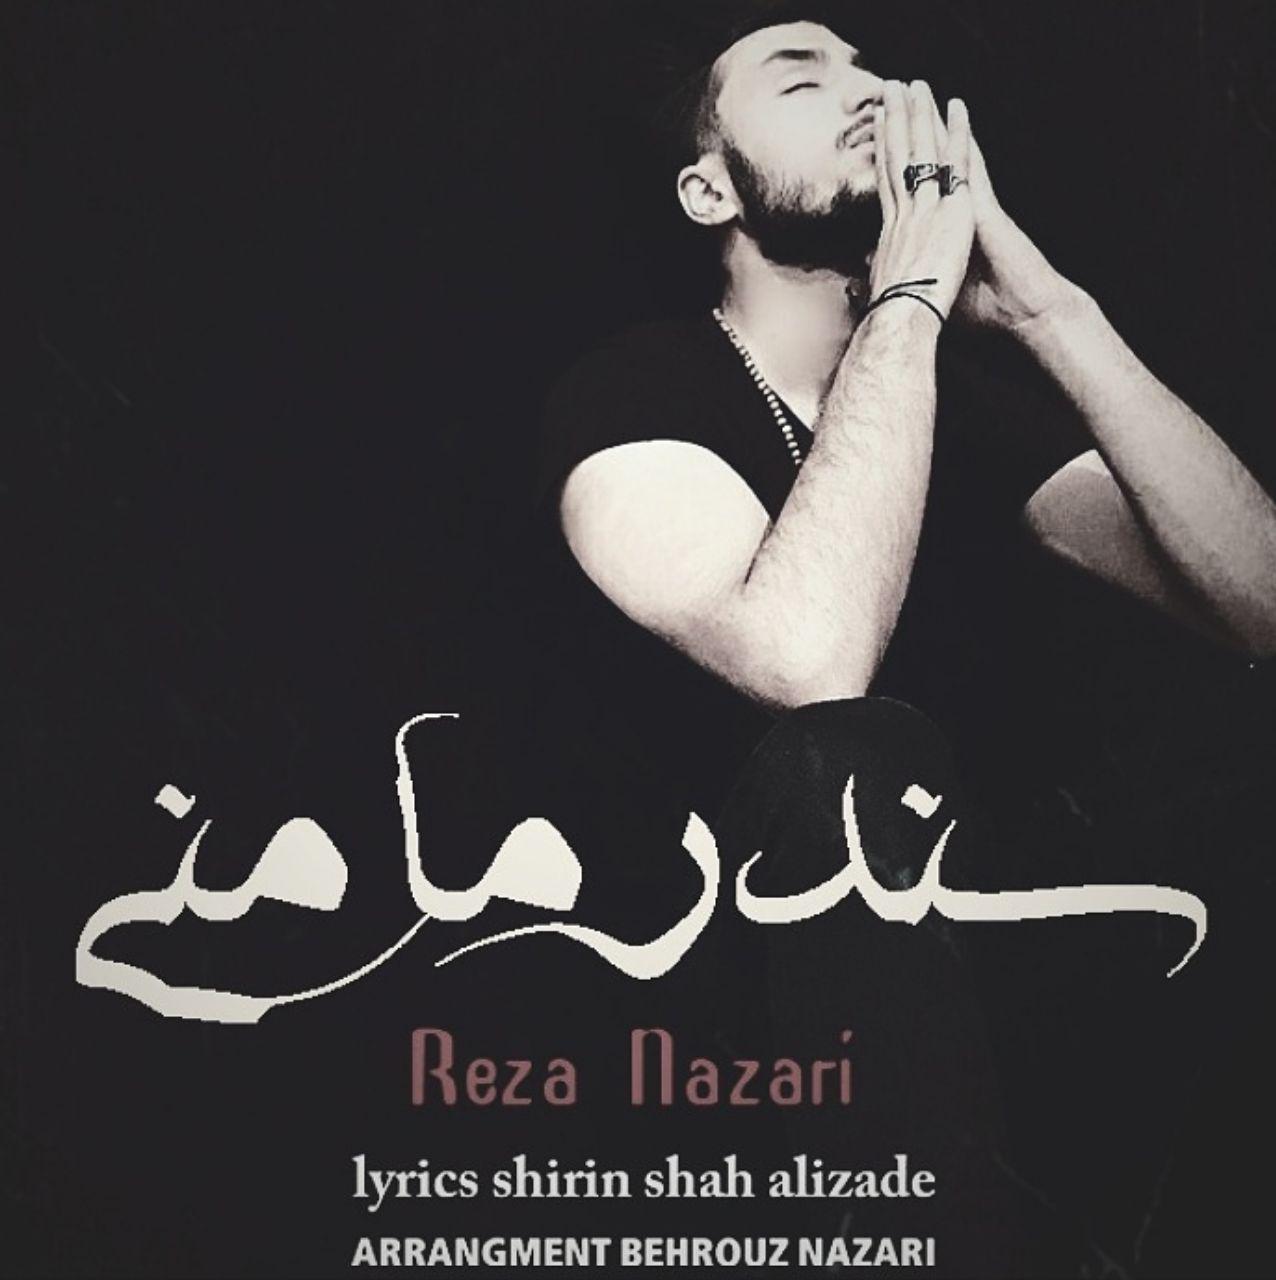 http://birtunes.ir/wp-content/uploads/2018/11/Reza-Nazari-Sinidirma-Mani.jpg